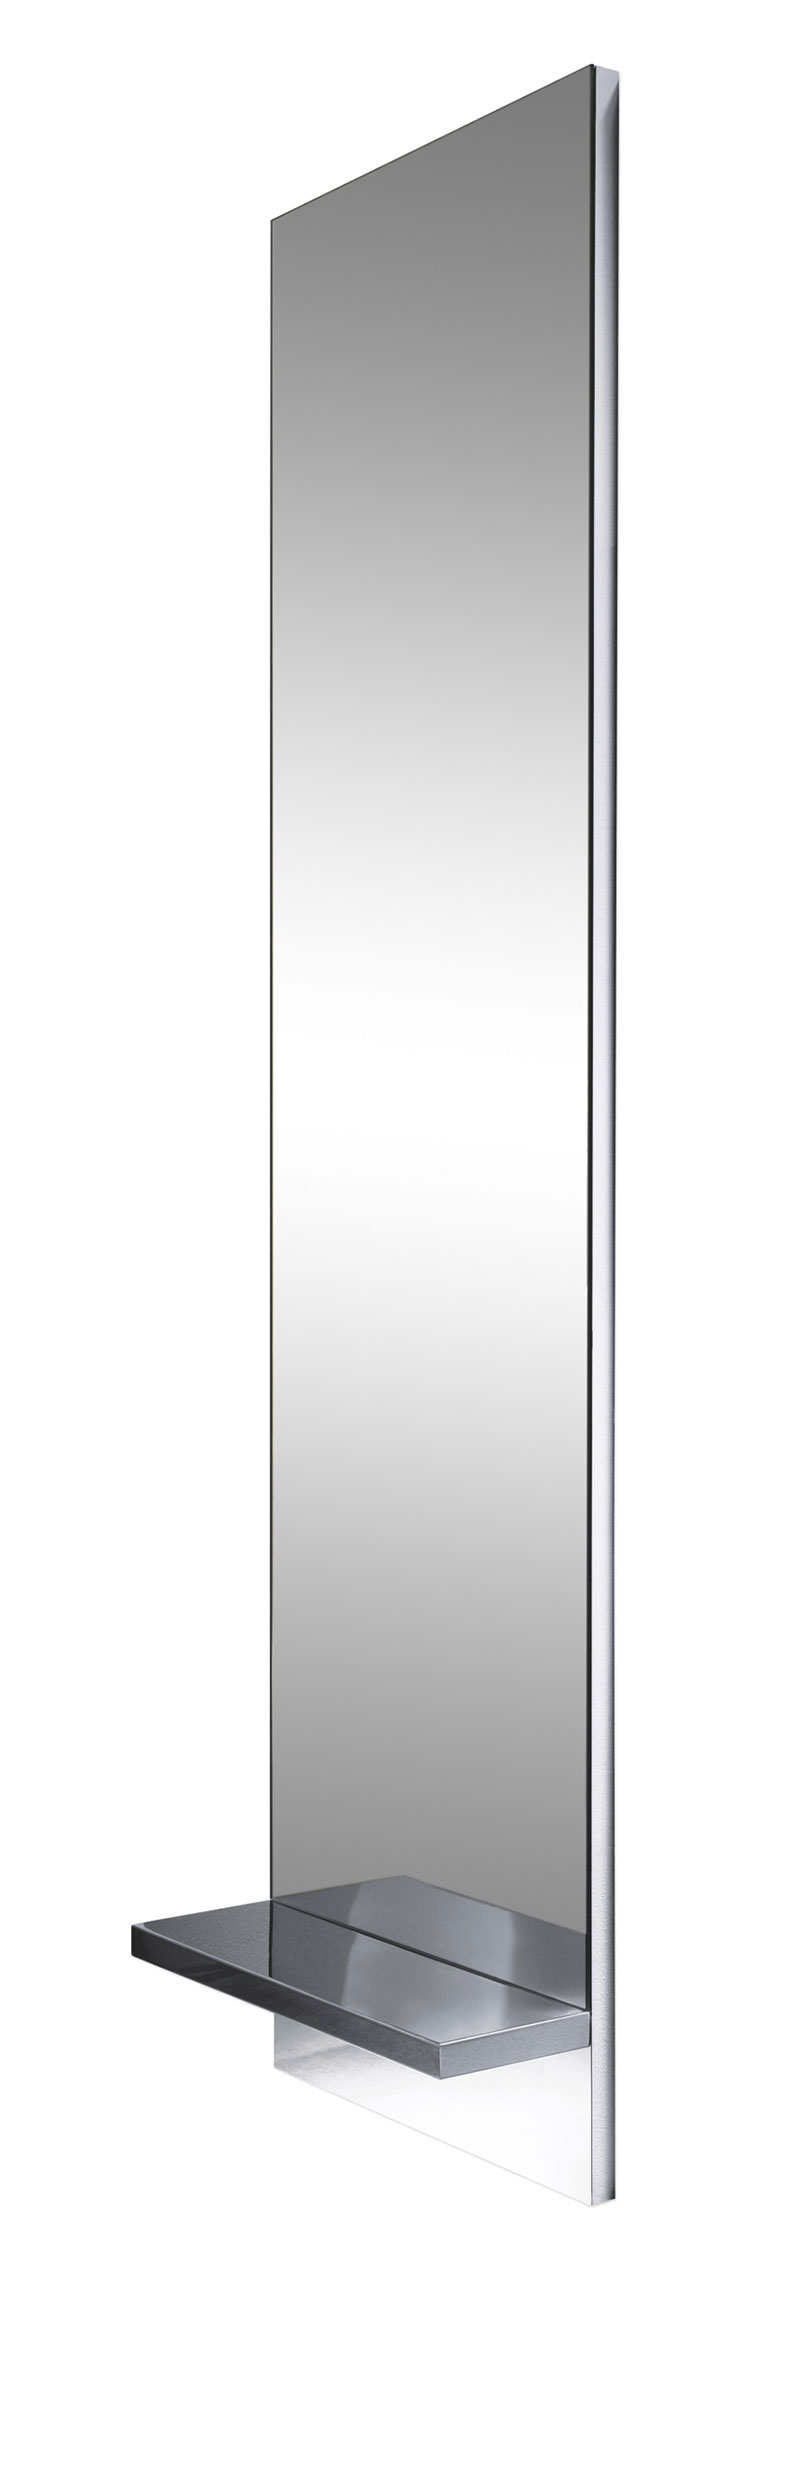 Oglinda coafor POD